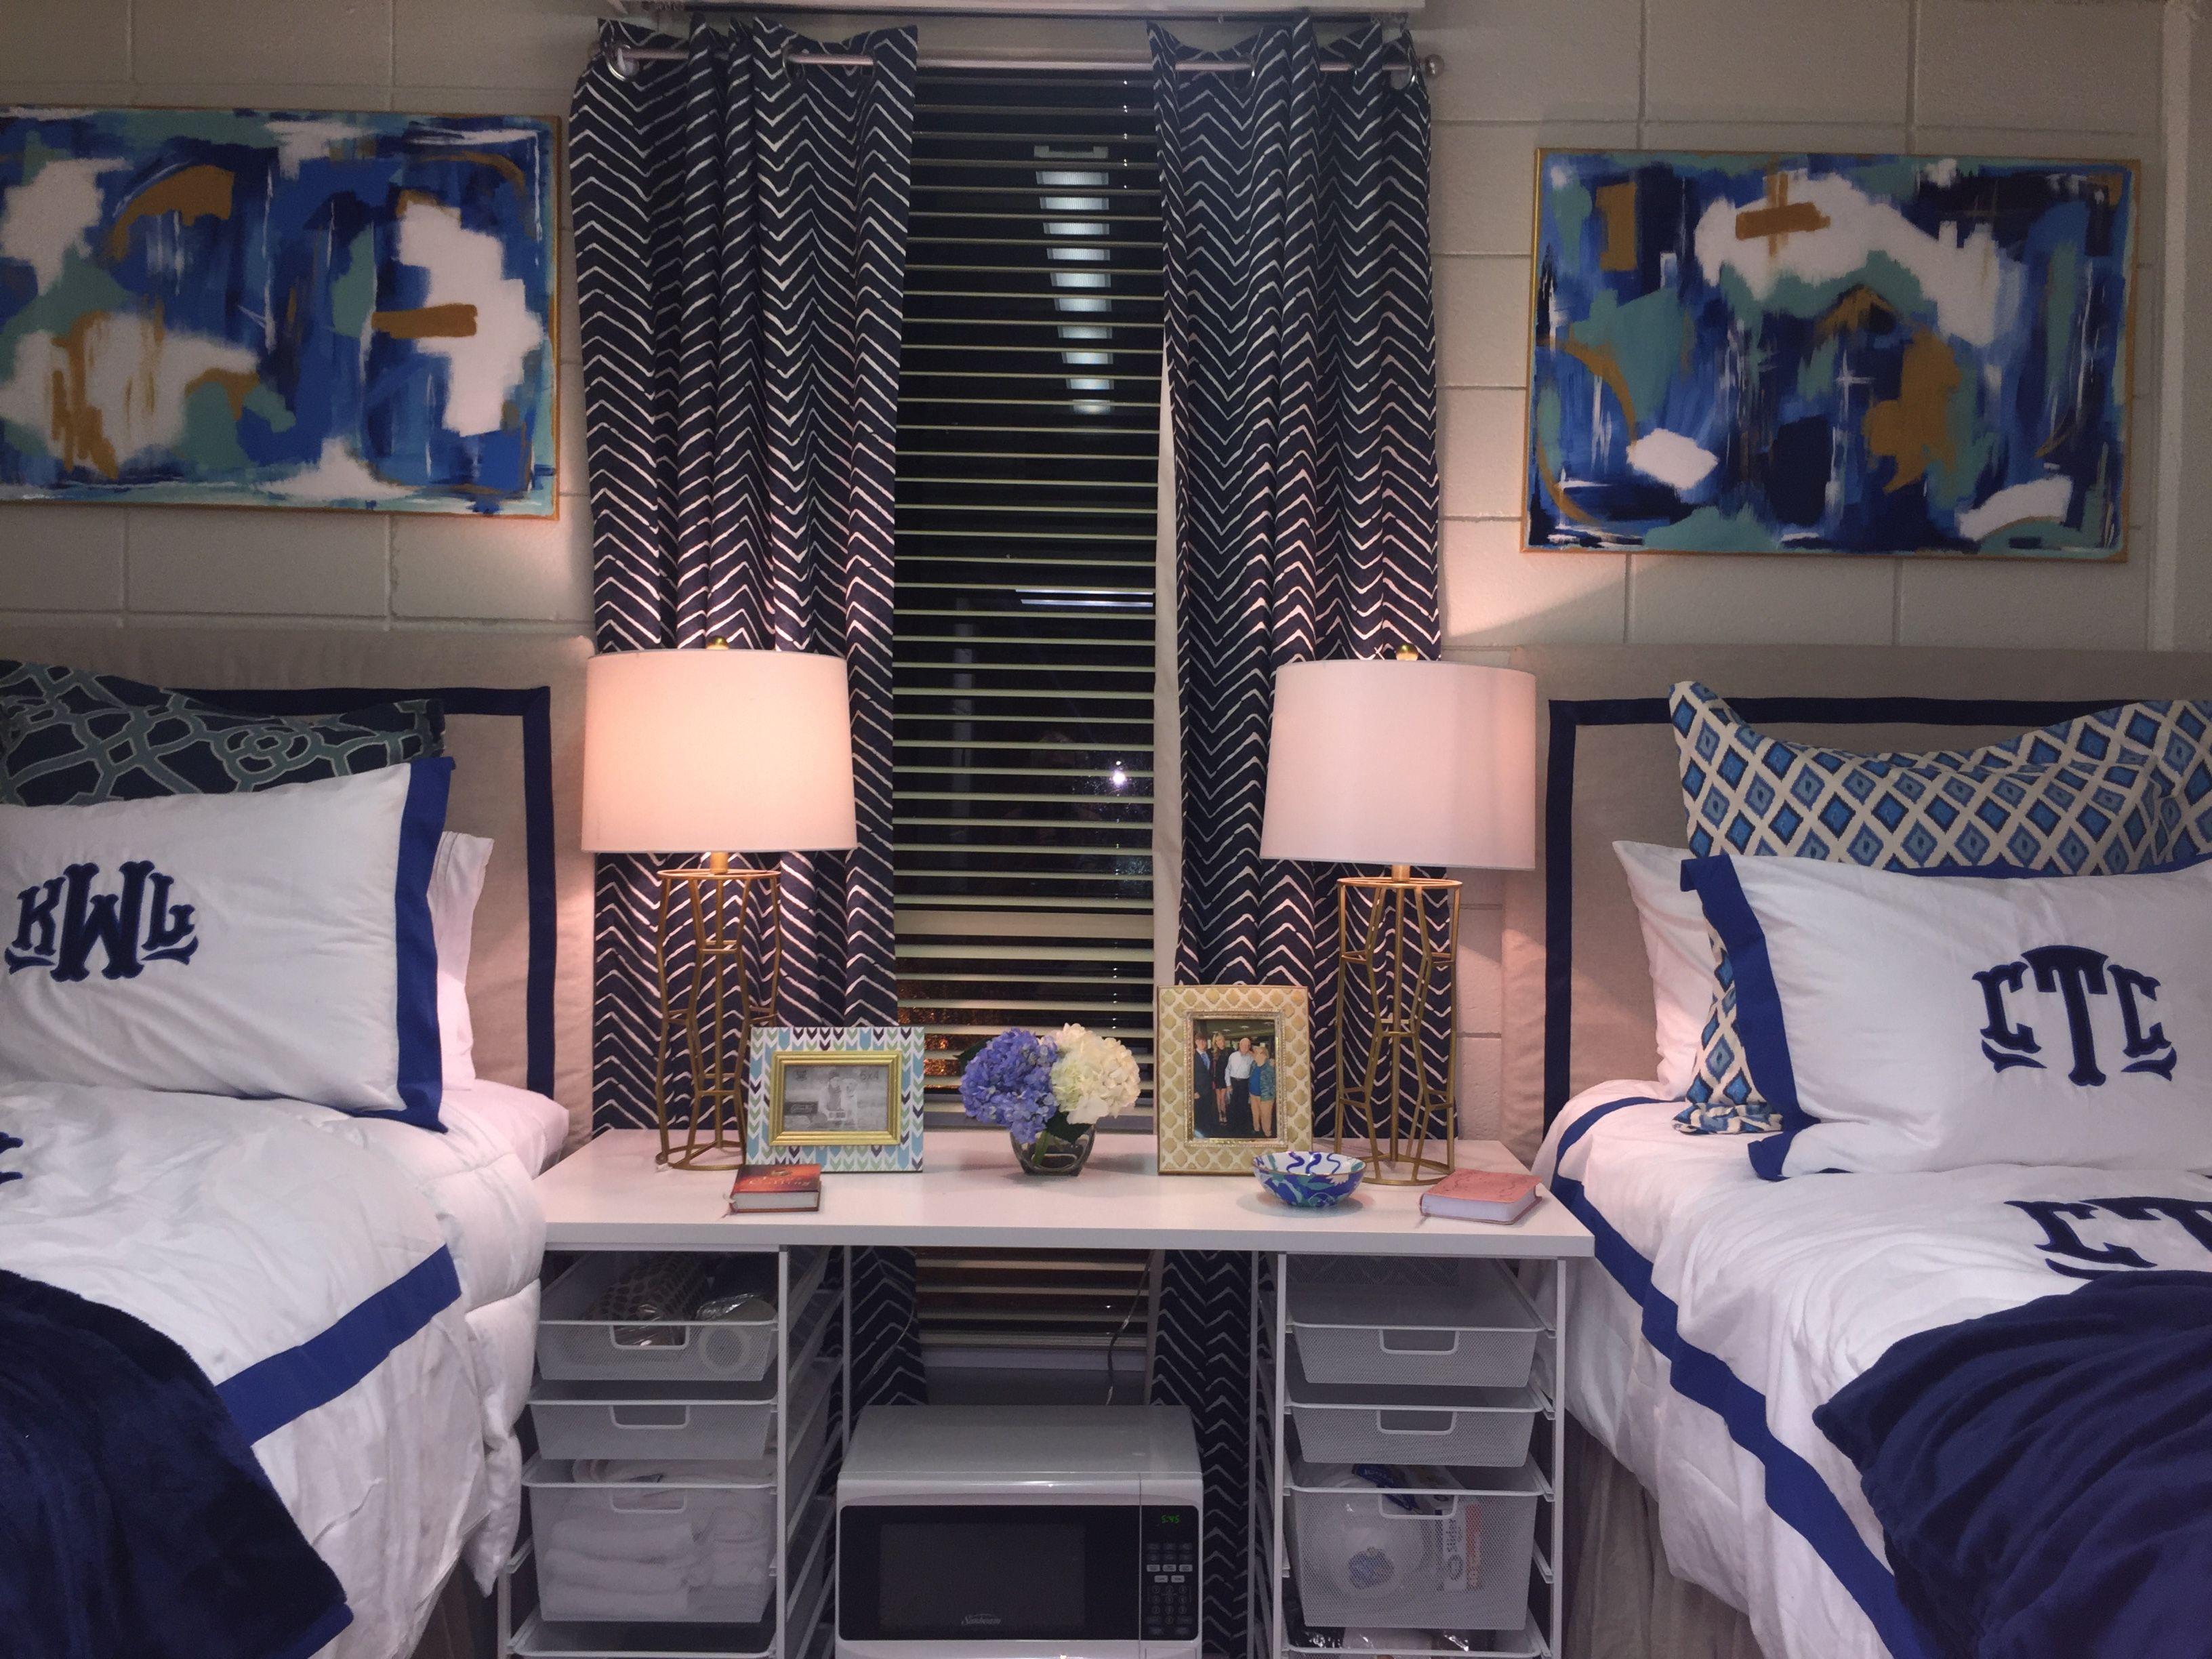 Miller Hall Lsu Dorm Dorm Room Designs Dorm Room